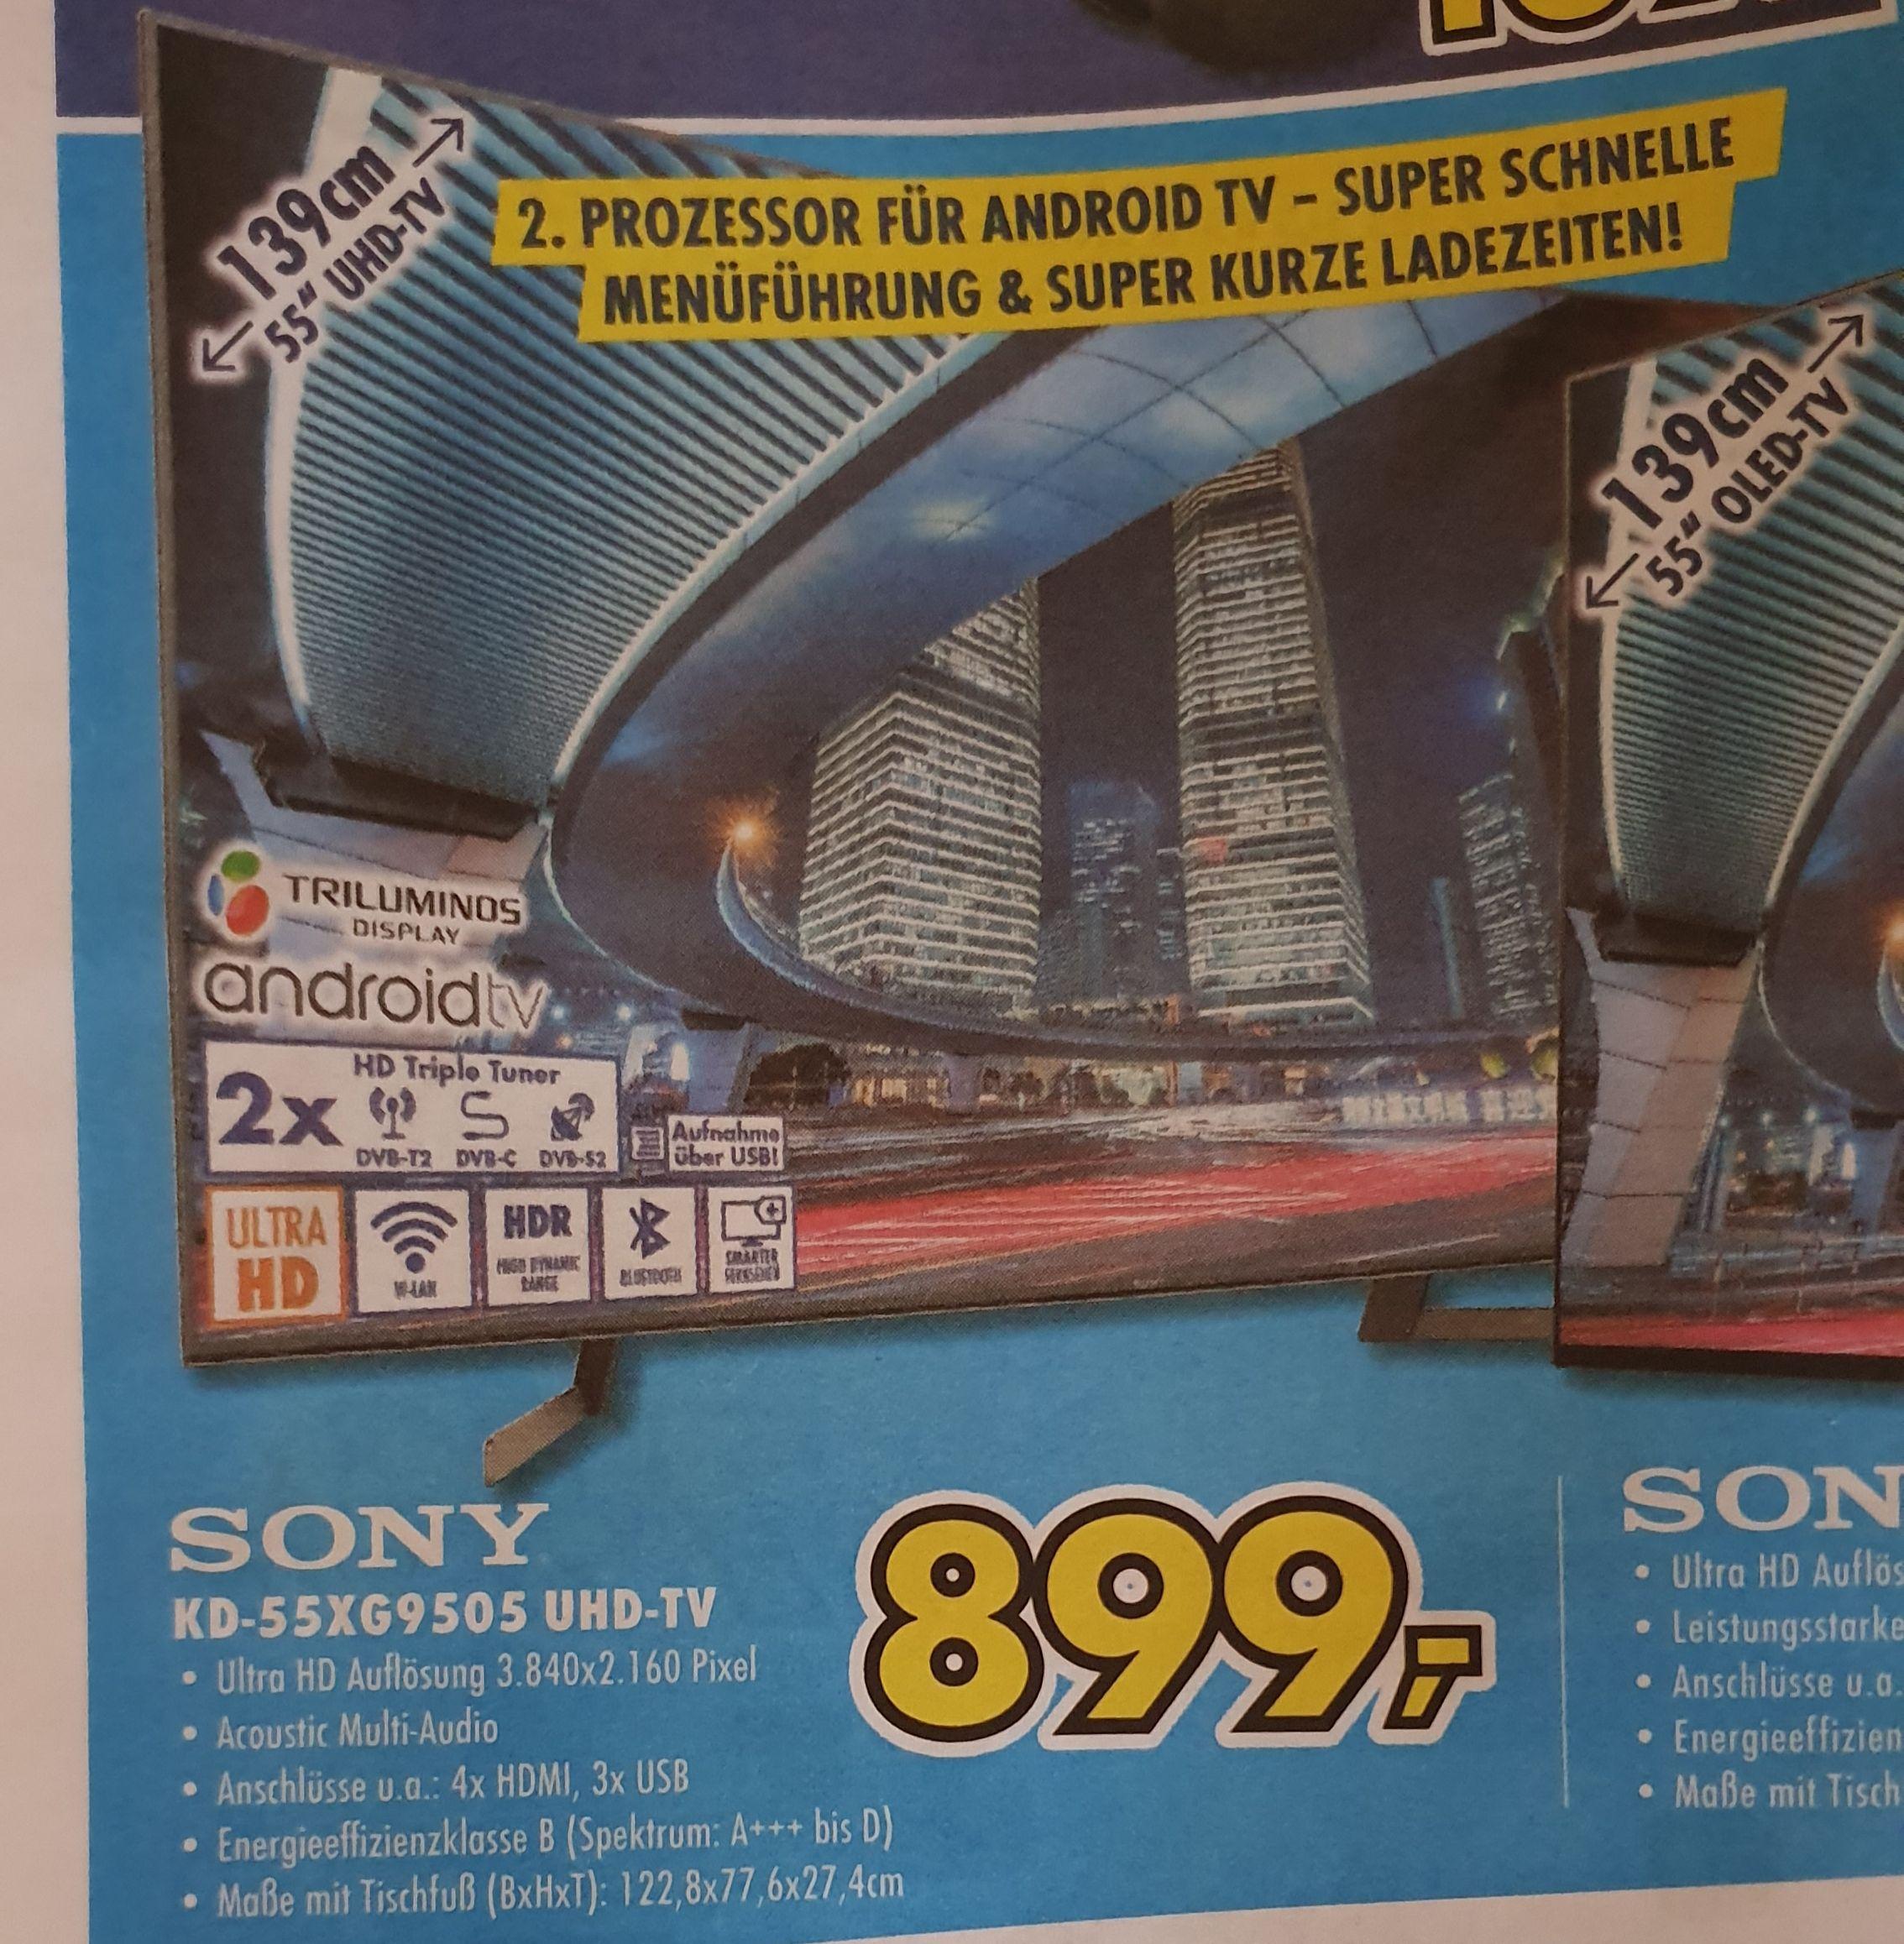 Sony KD-55XG9505 UHD TV Fernseher, möglicherweise lokal